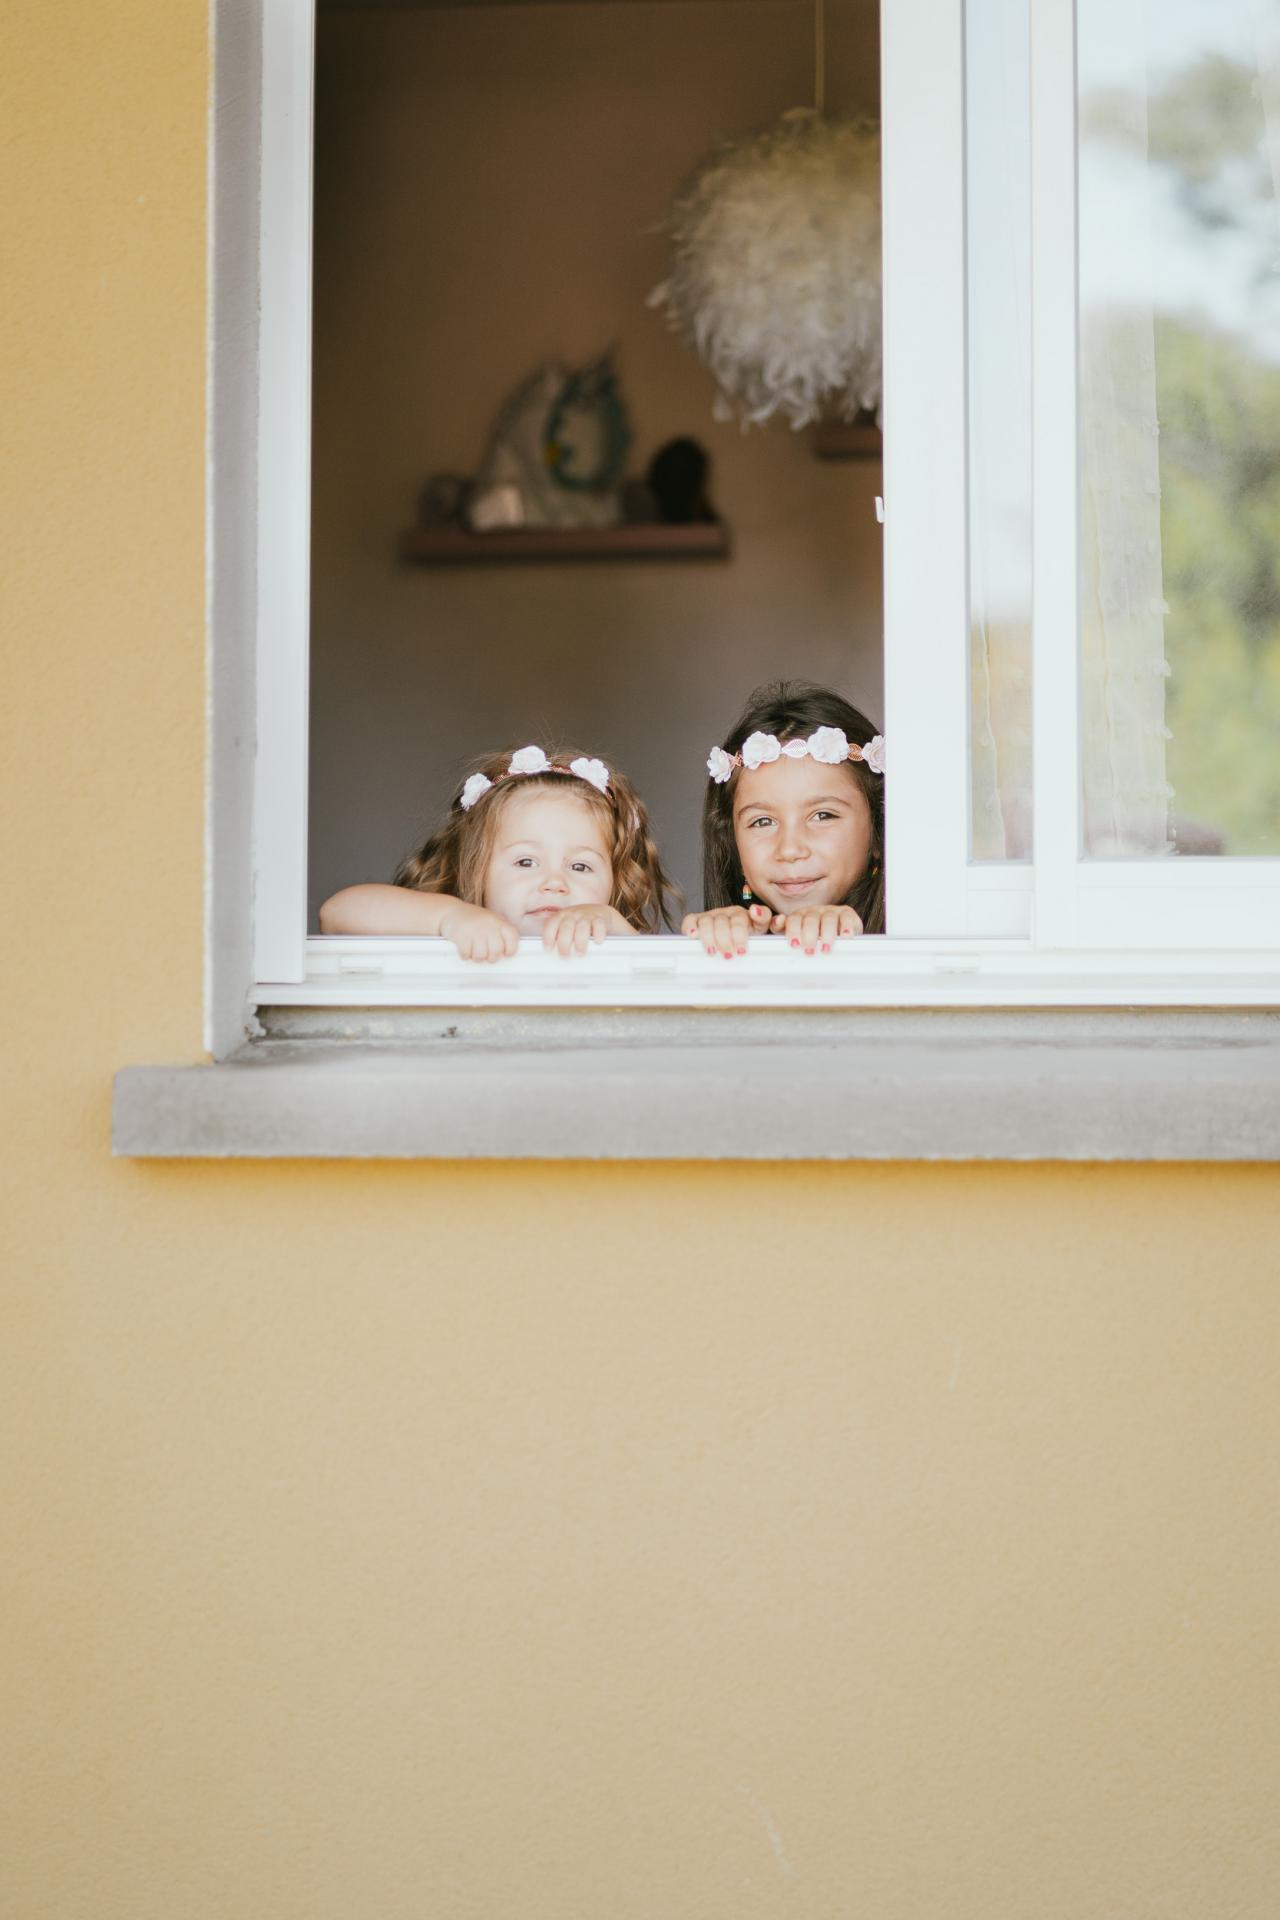 Photographe aquitaine photographe famille soeur fenetre